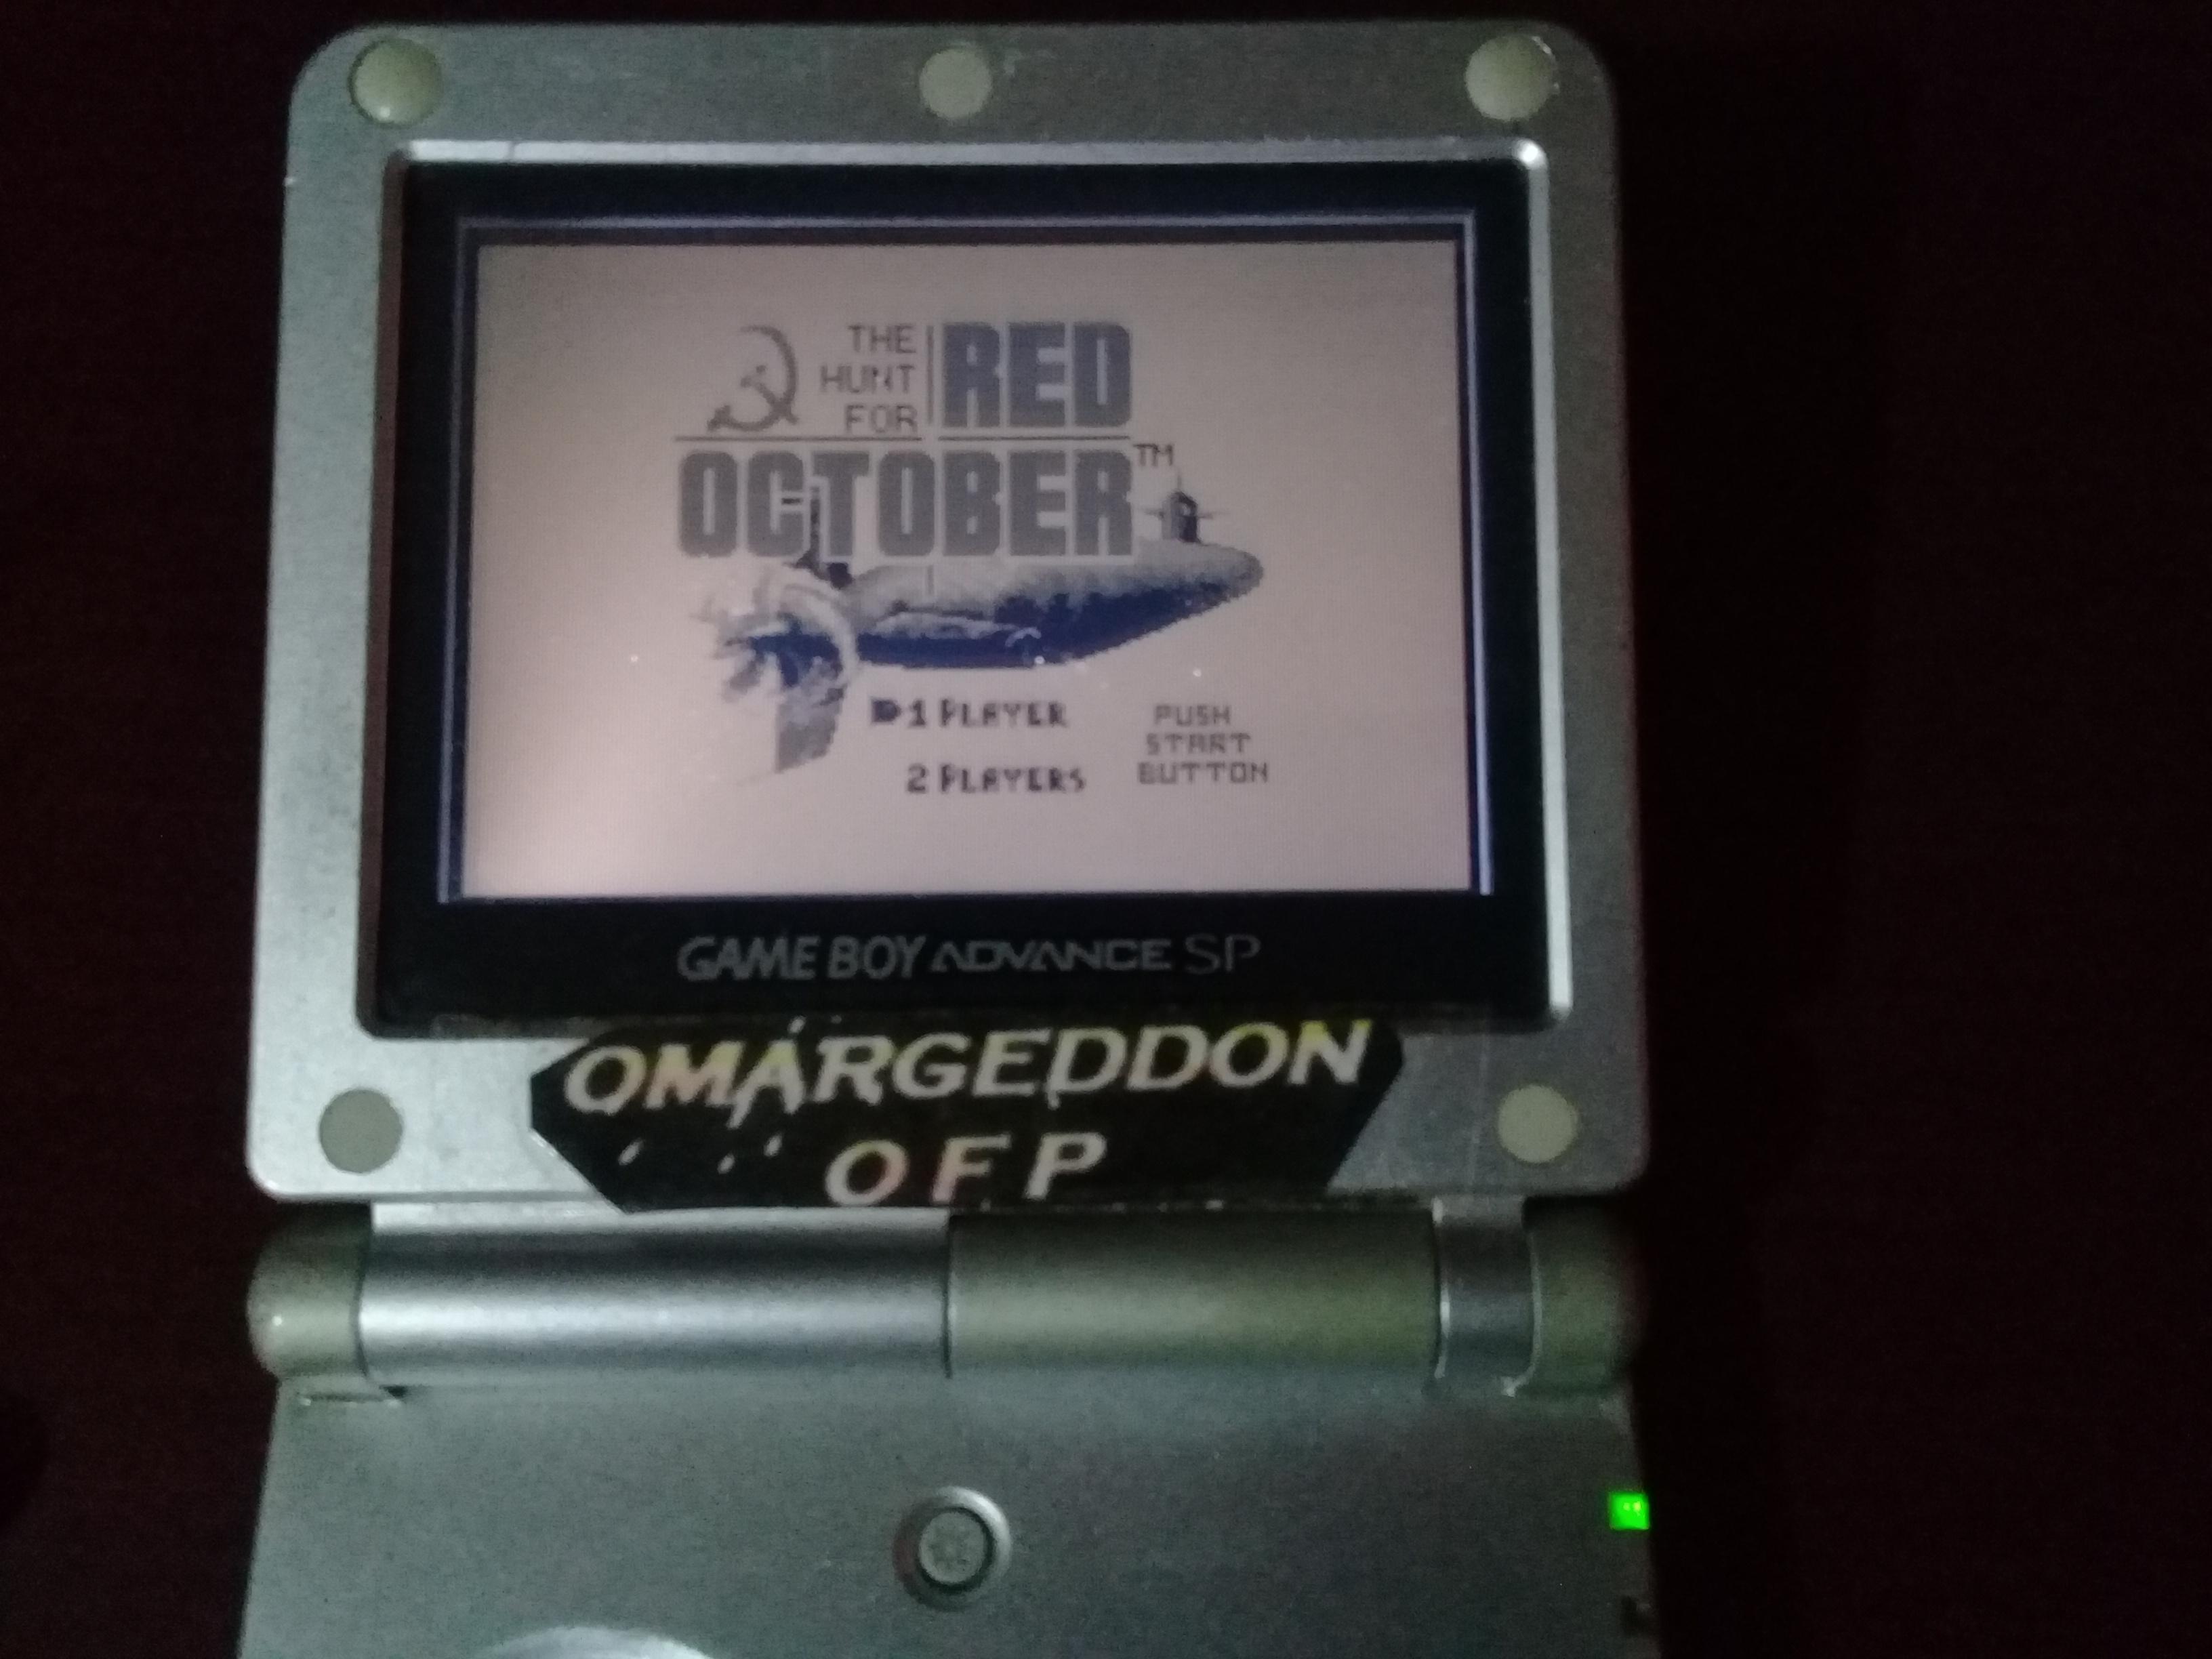 omargeddon: The Hunt For Red October (Game Boy Emulated) 275 points on 2019-04-16 13:47:53